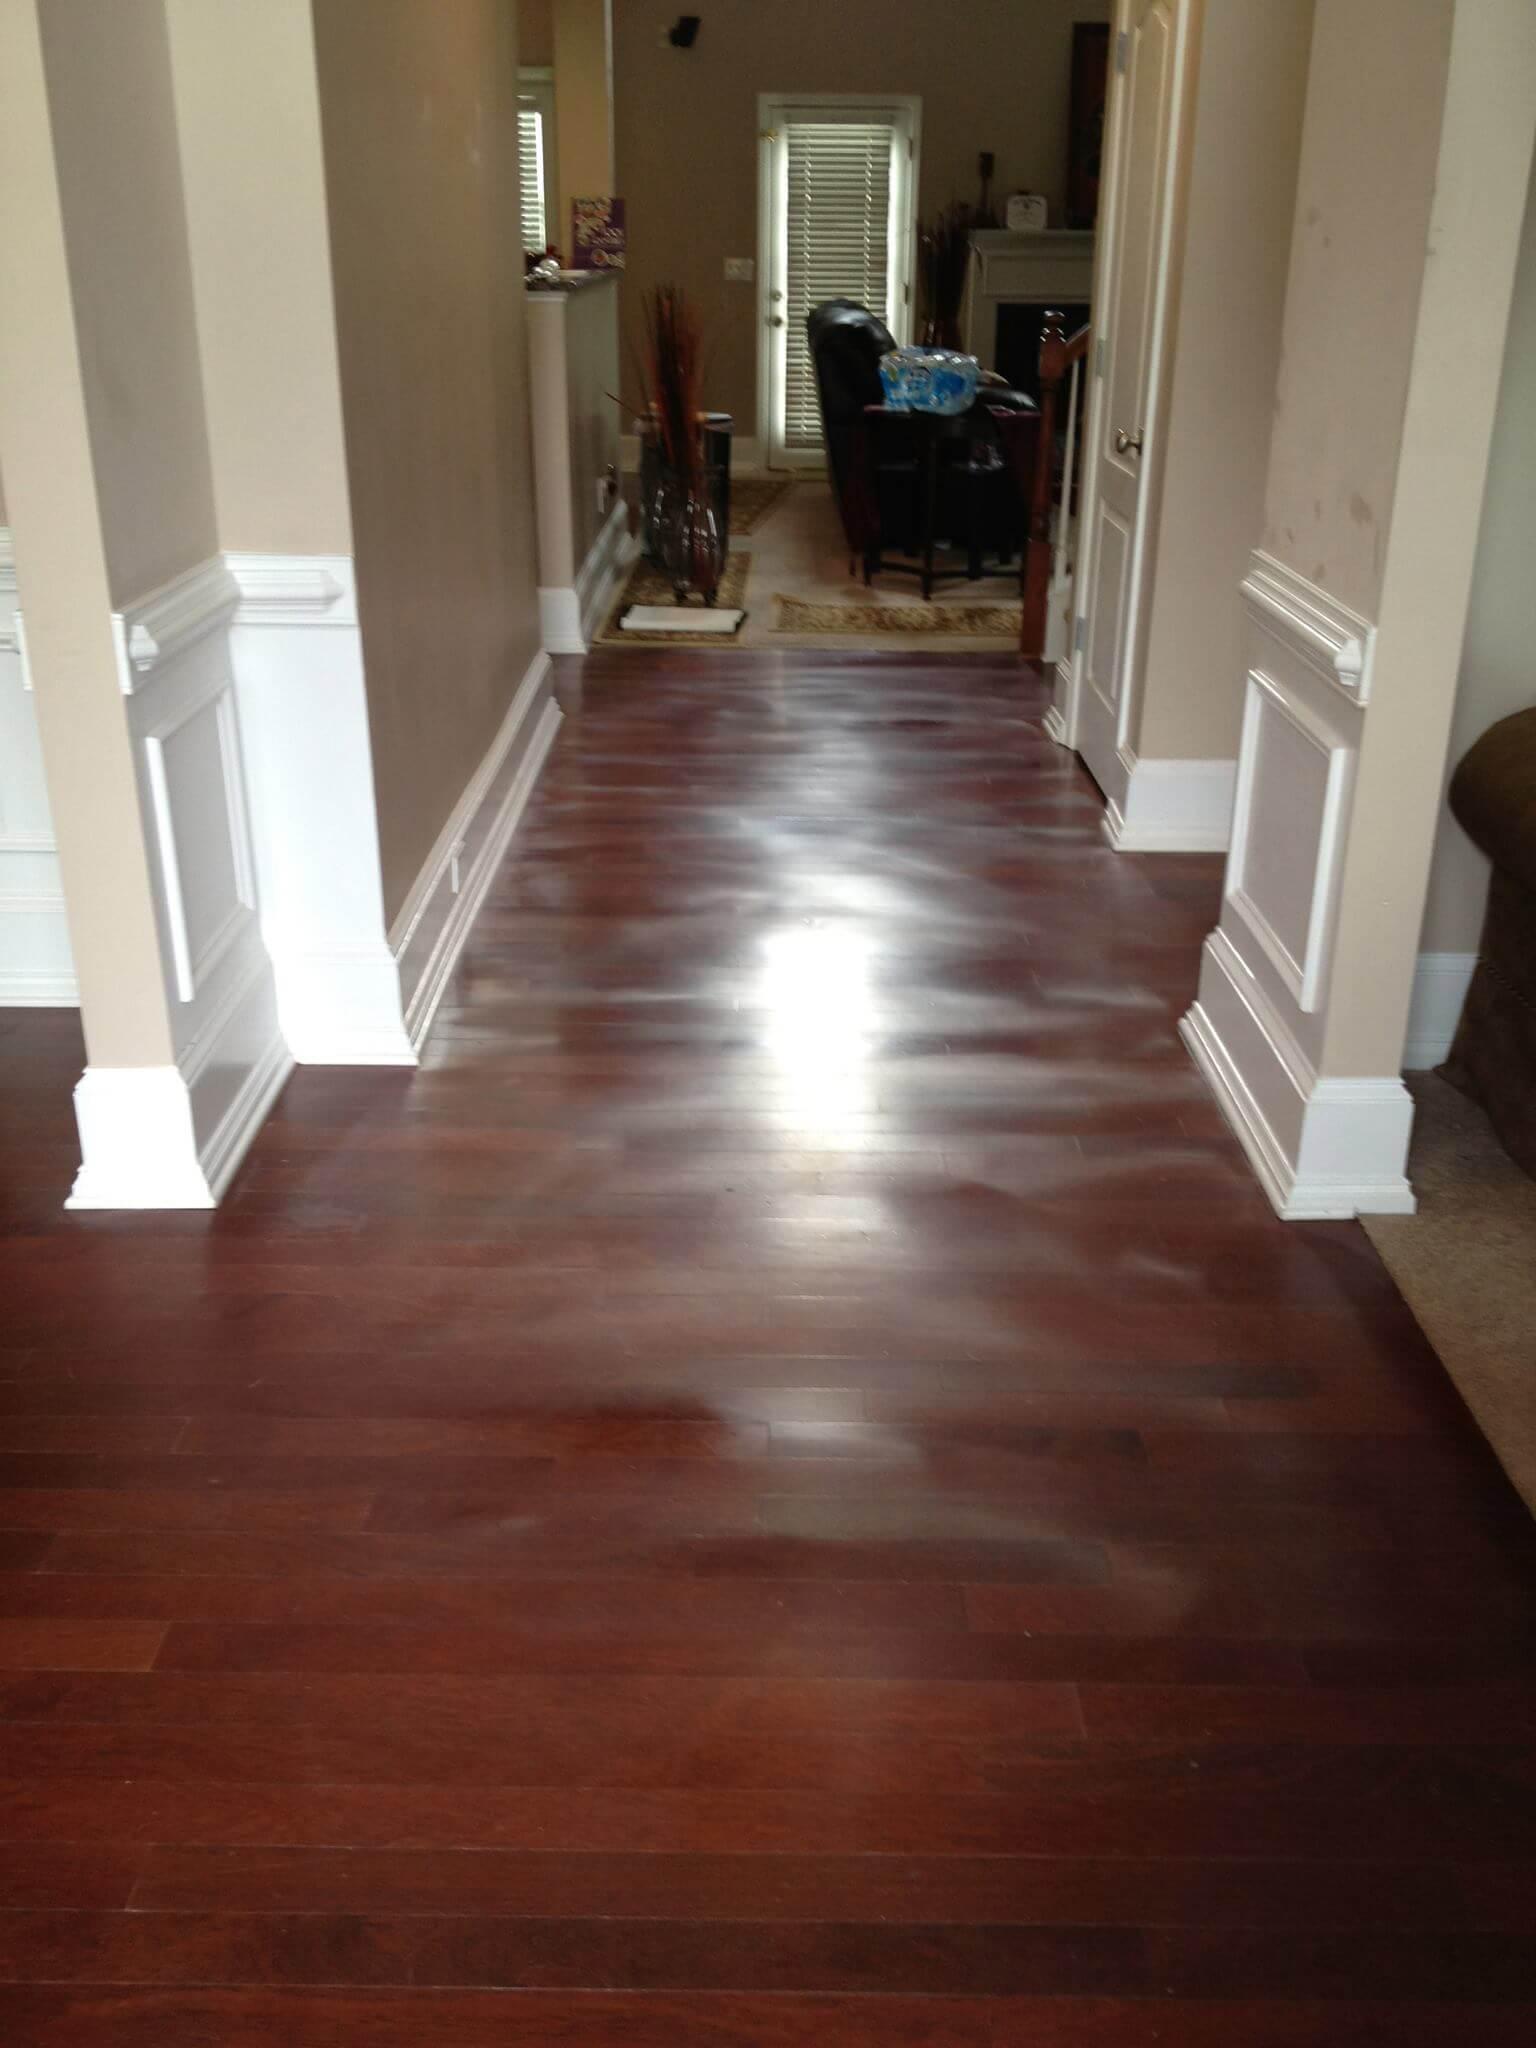 a hardwood floor showing signs of warping